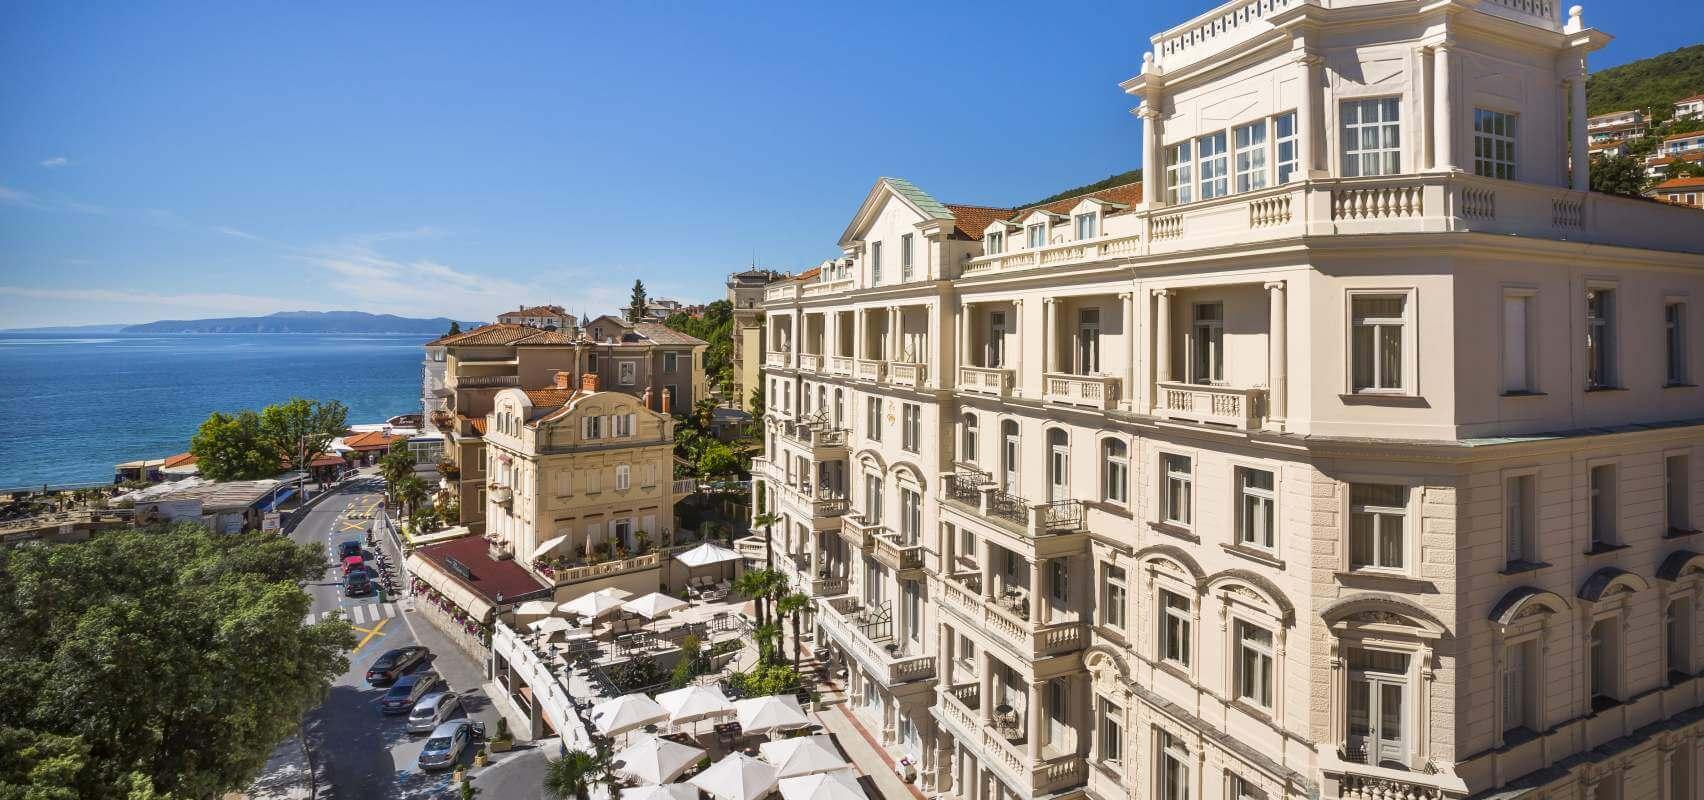 Hotel palace bellevue opatija croatia remisens hotels for Hotel palace